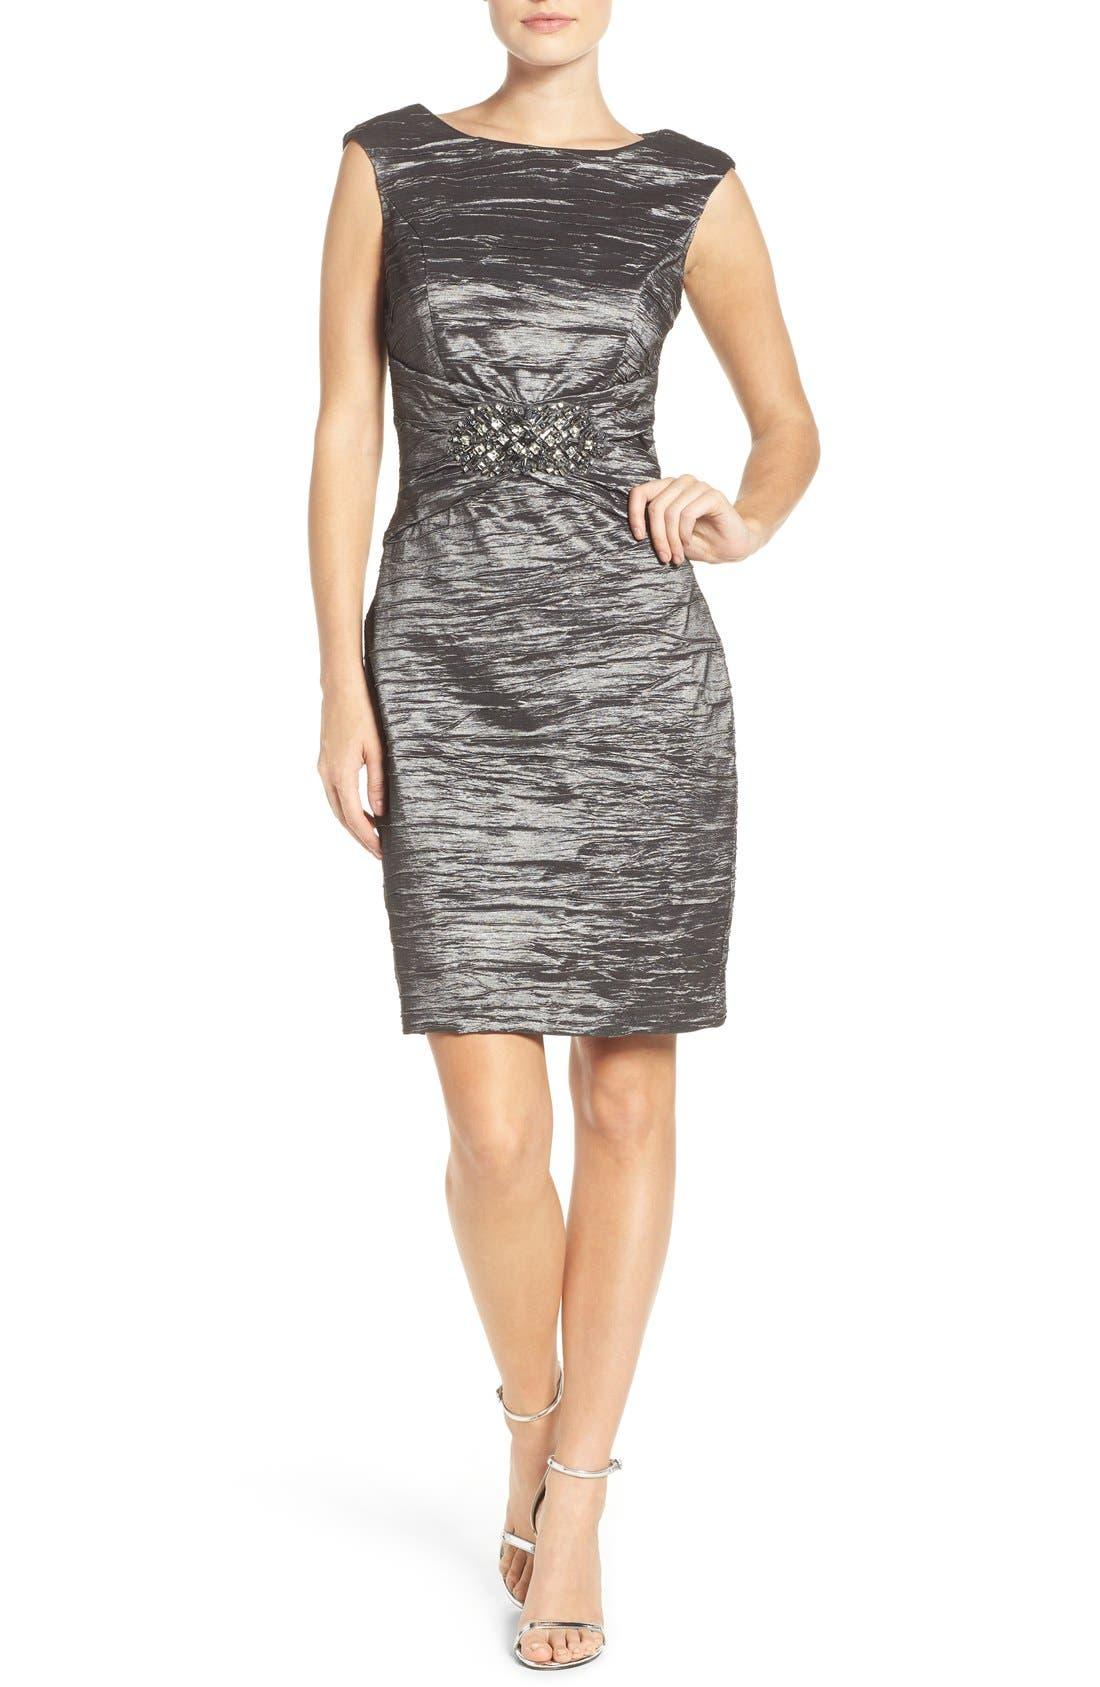 Embellished Taffeta Sheath Dress,                             Alternate thumbnail 10, color,                             043